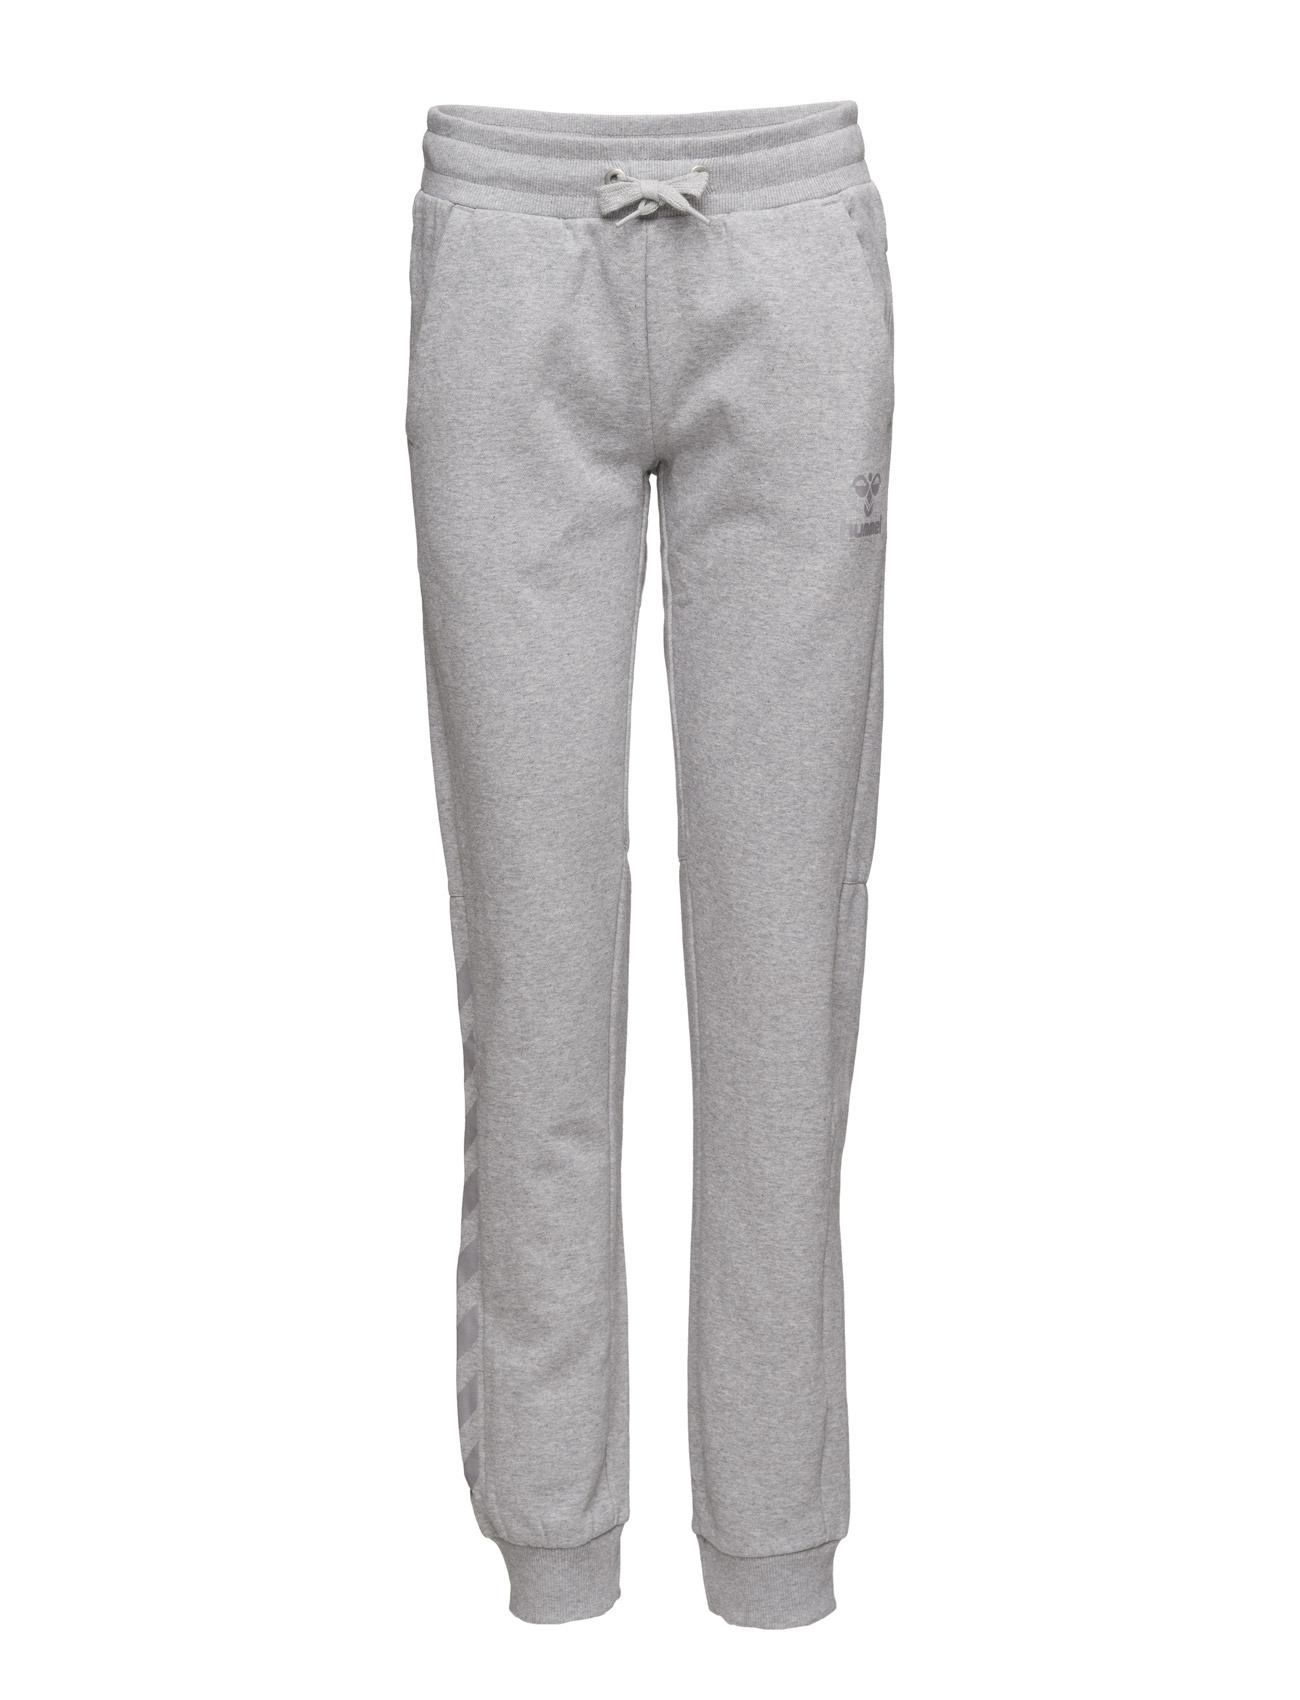 Classic Bee Wo Zen Pants Hummel Sportstøj til Unisex i